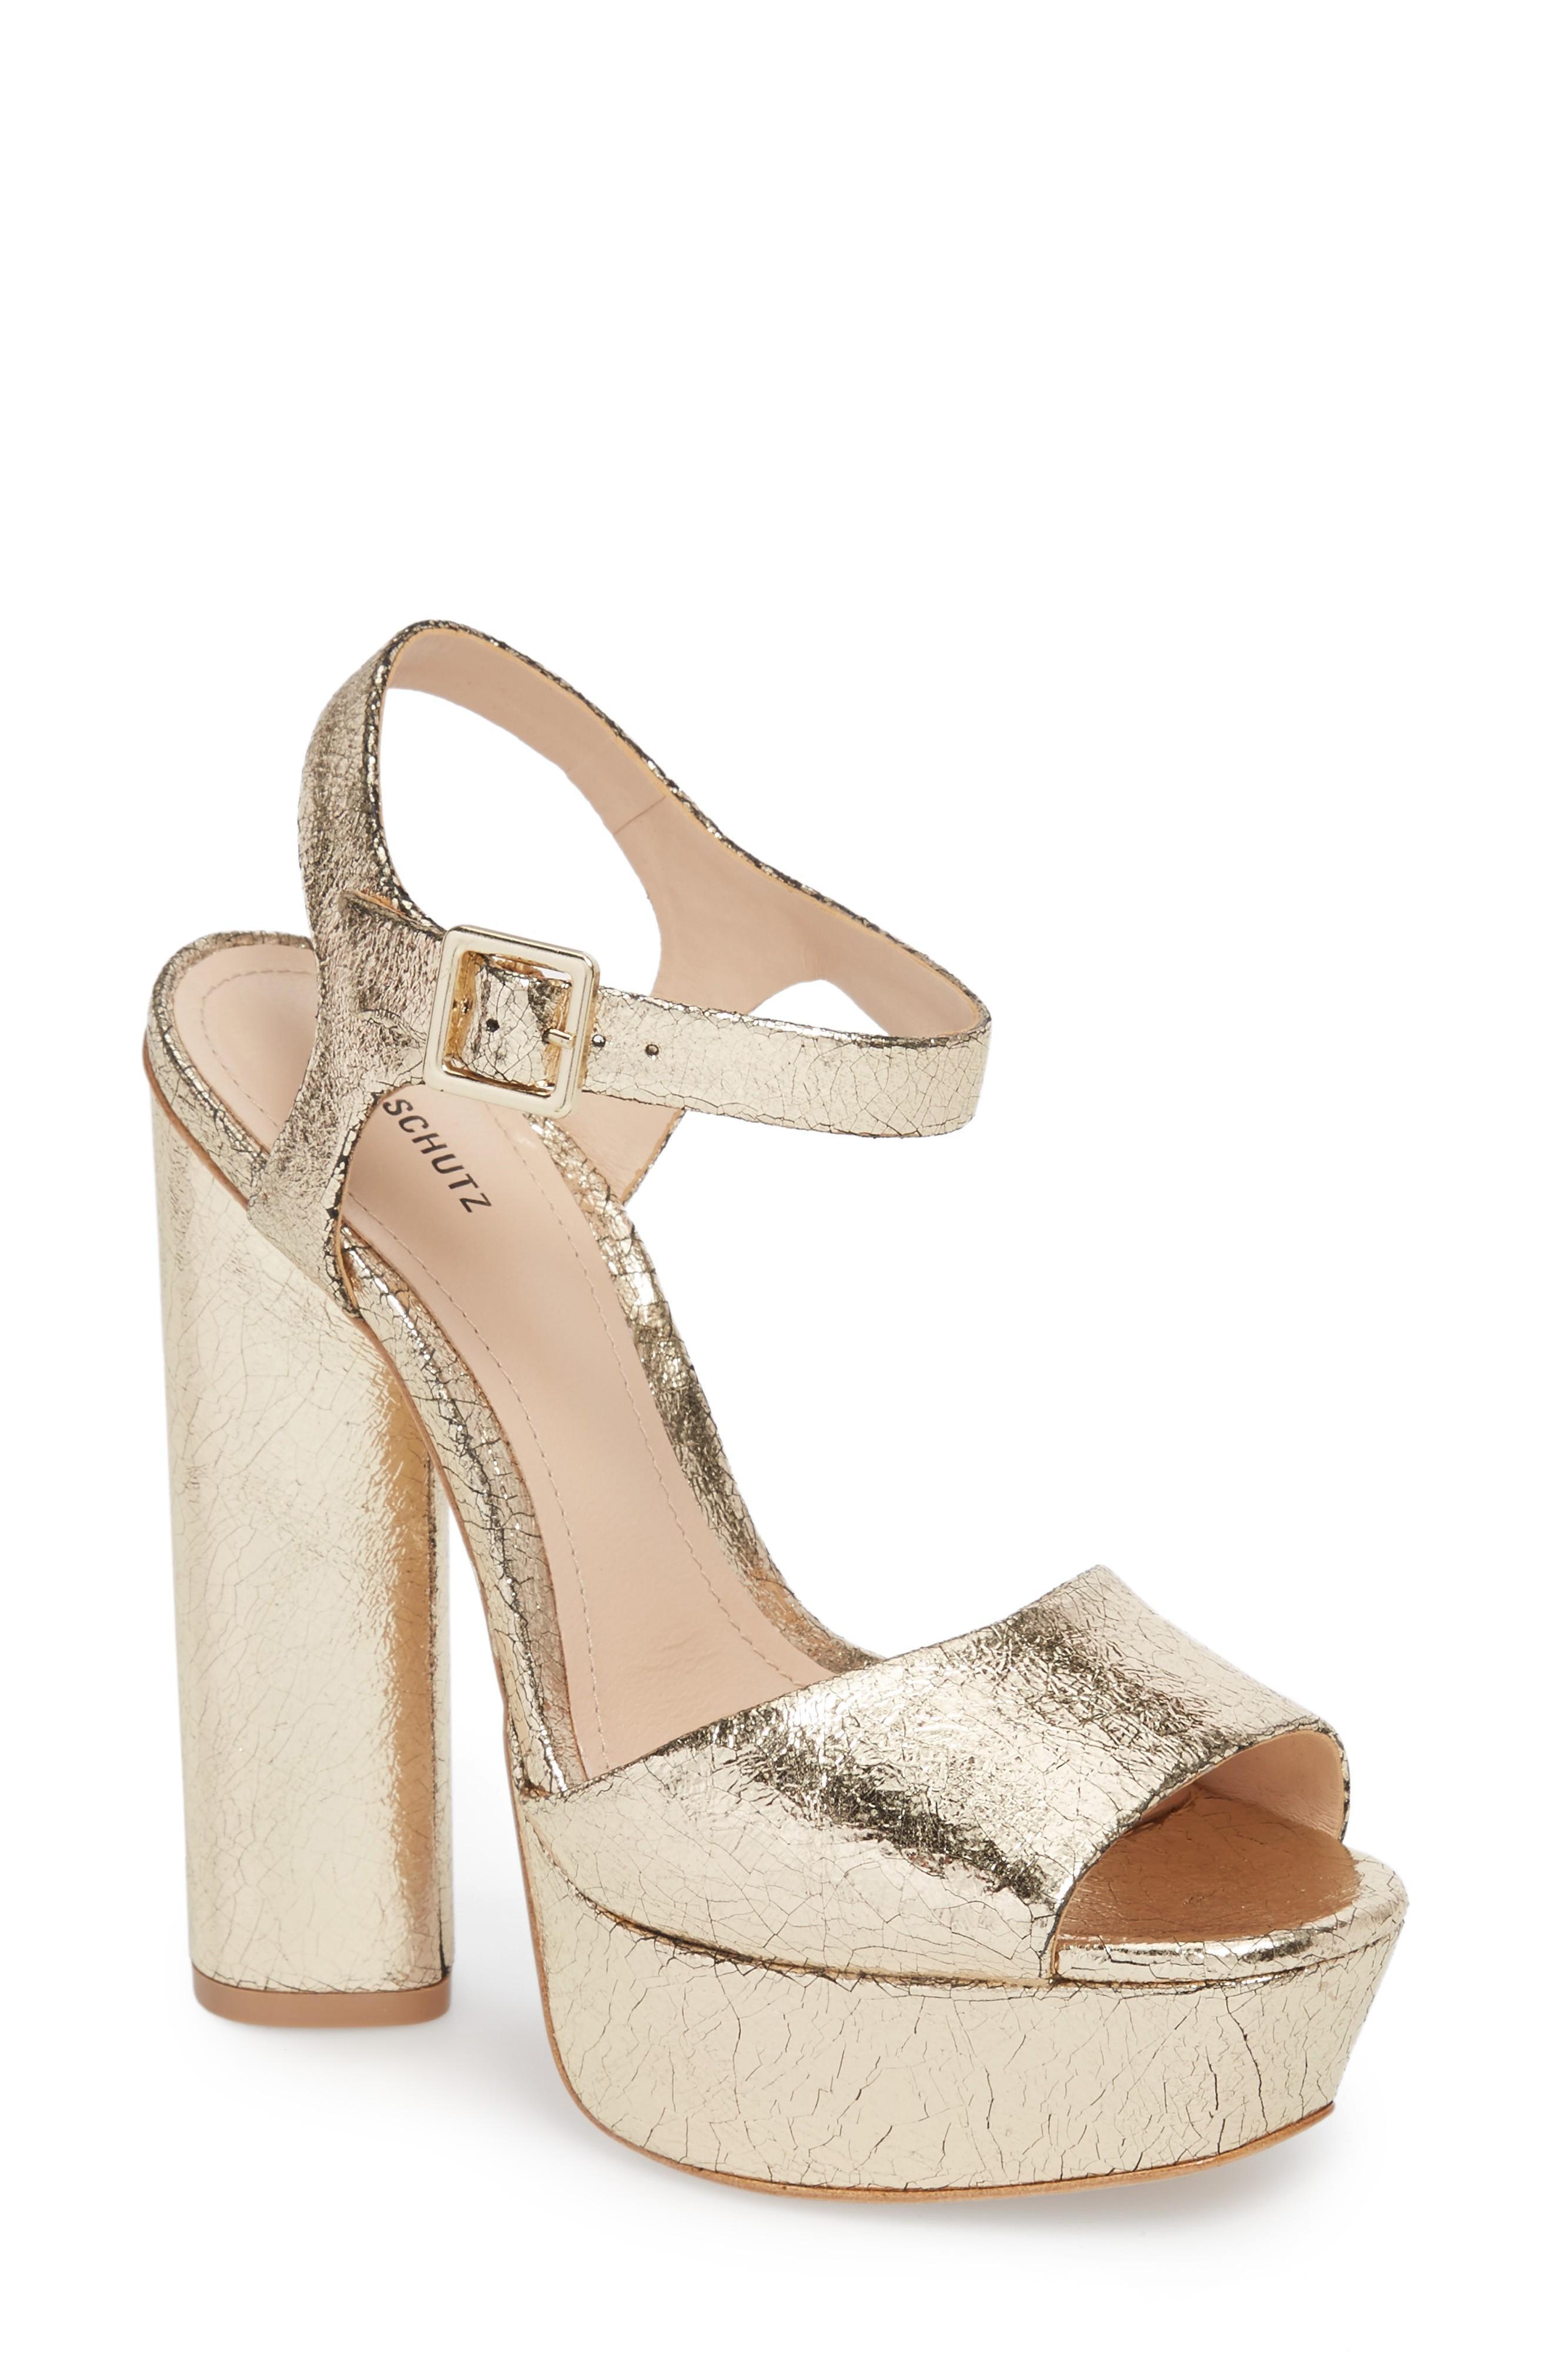 edf5e2ffb93c Schutz Jane Platform Sandal In Platina